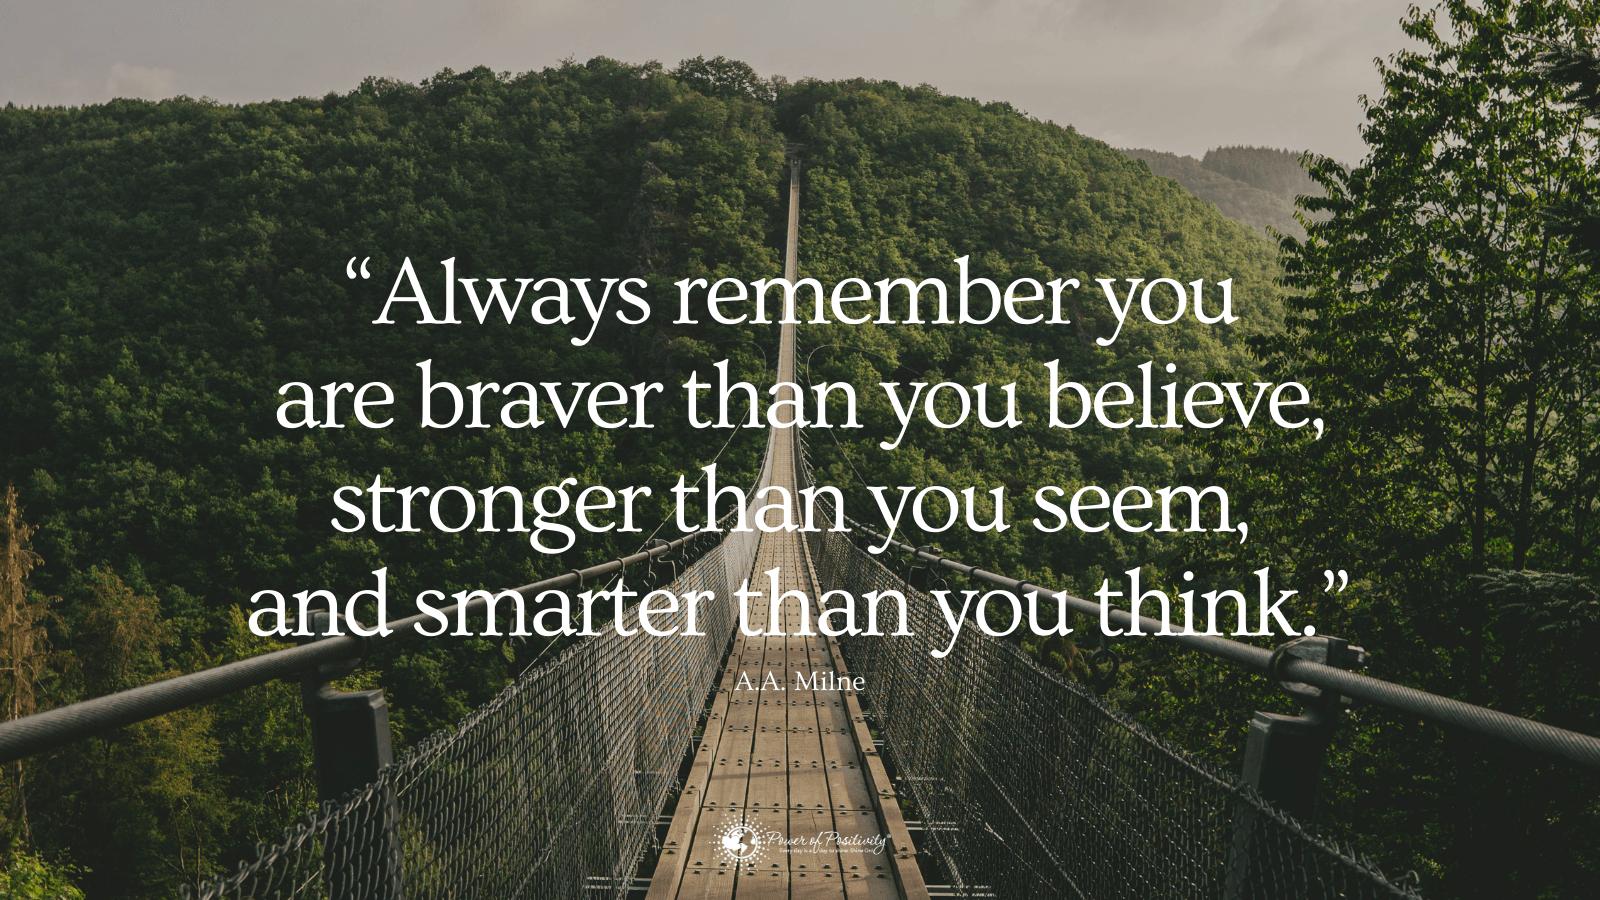 20 Uplifting Quotes to Make it Through Hard Times